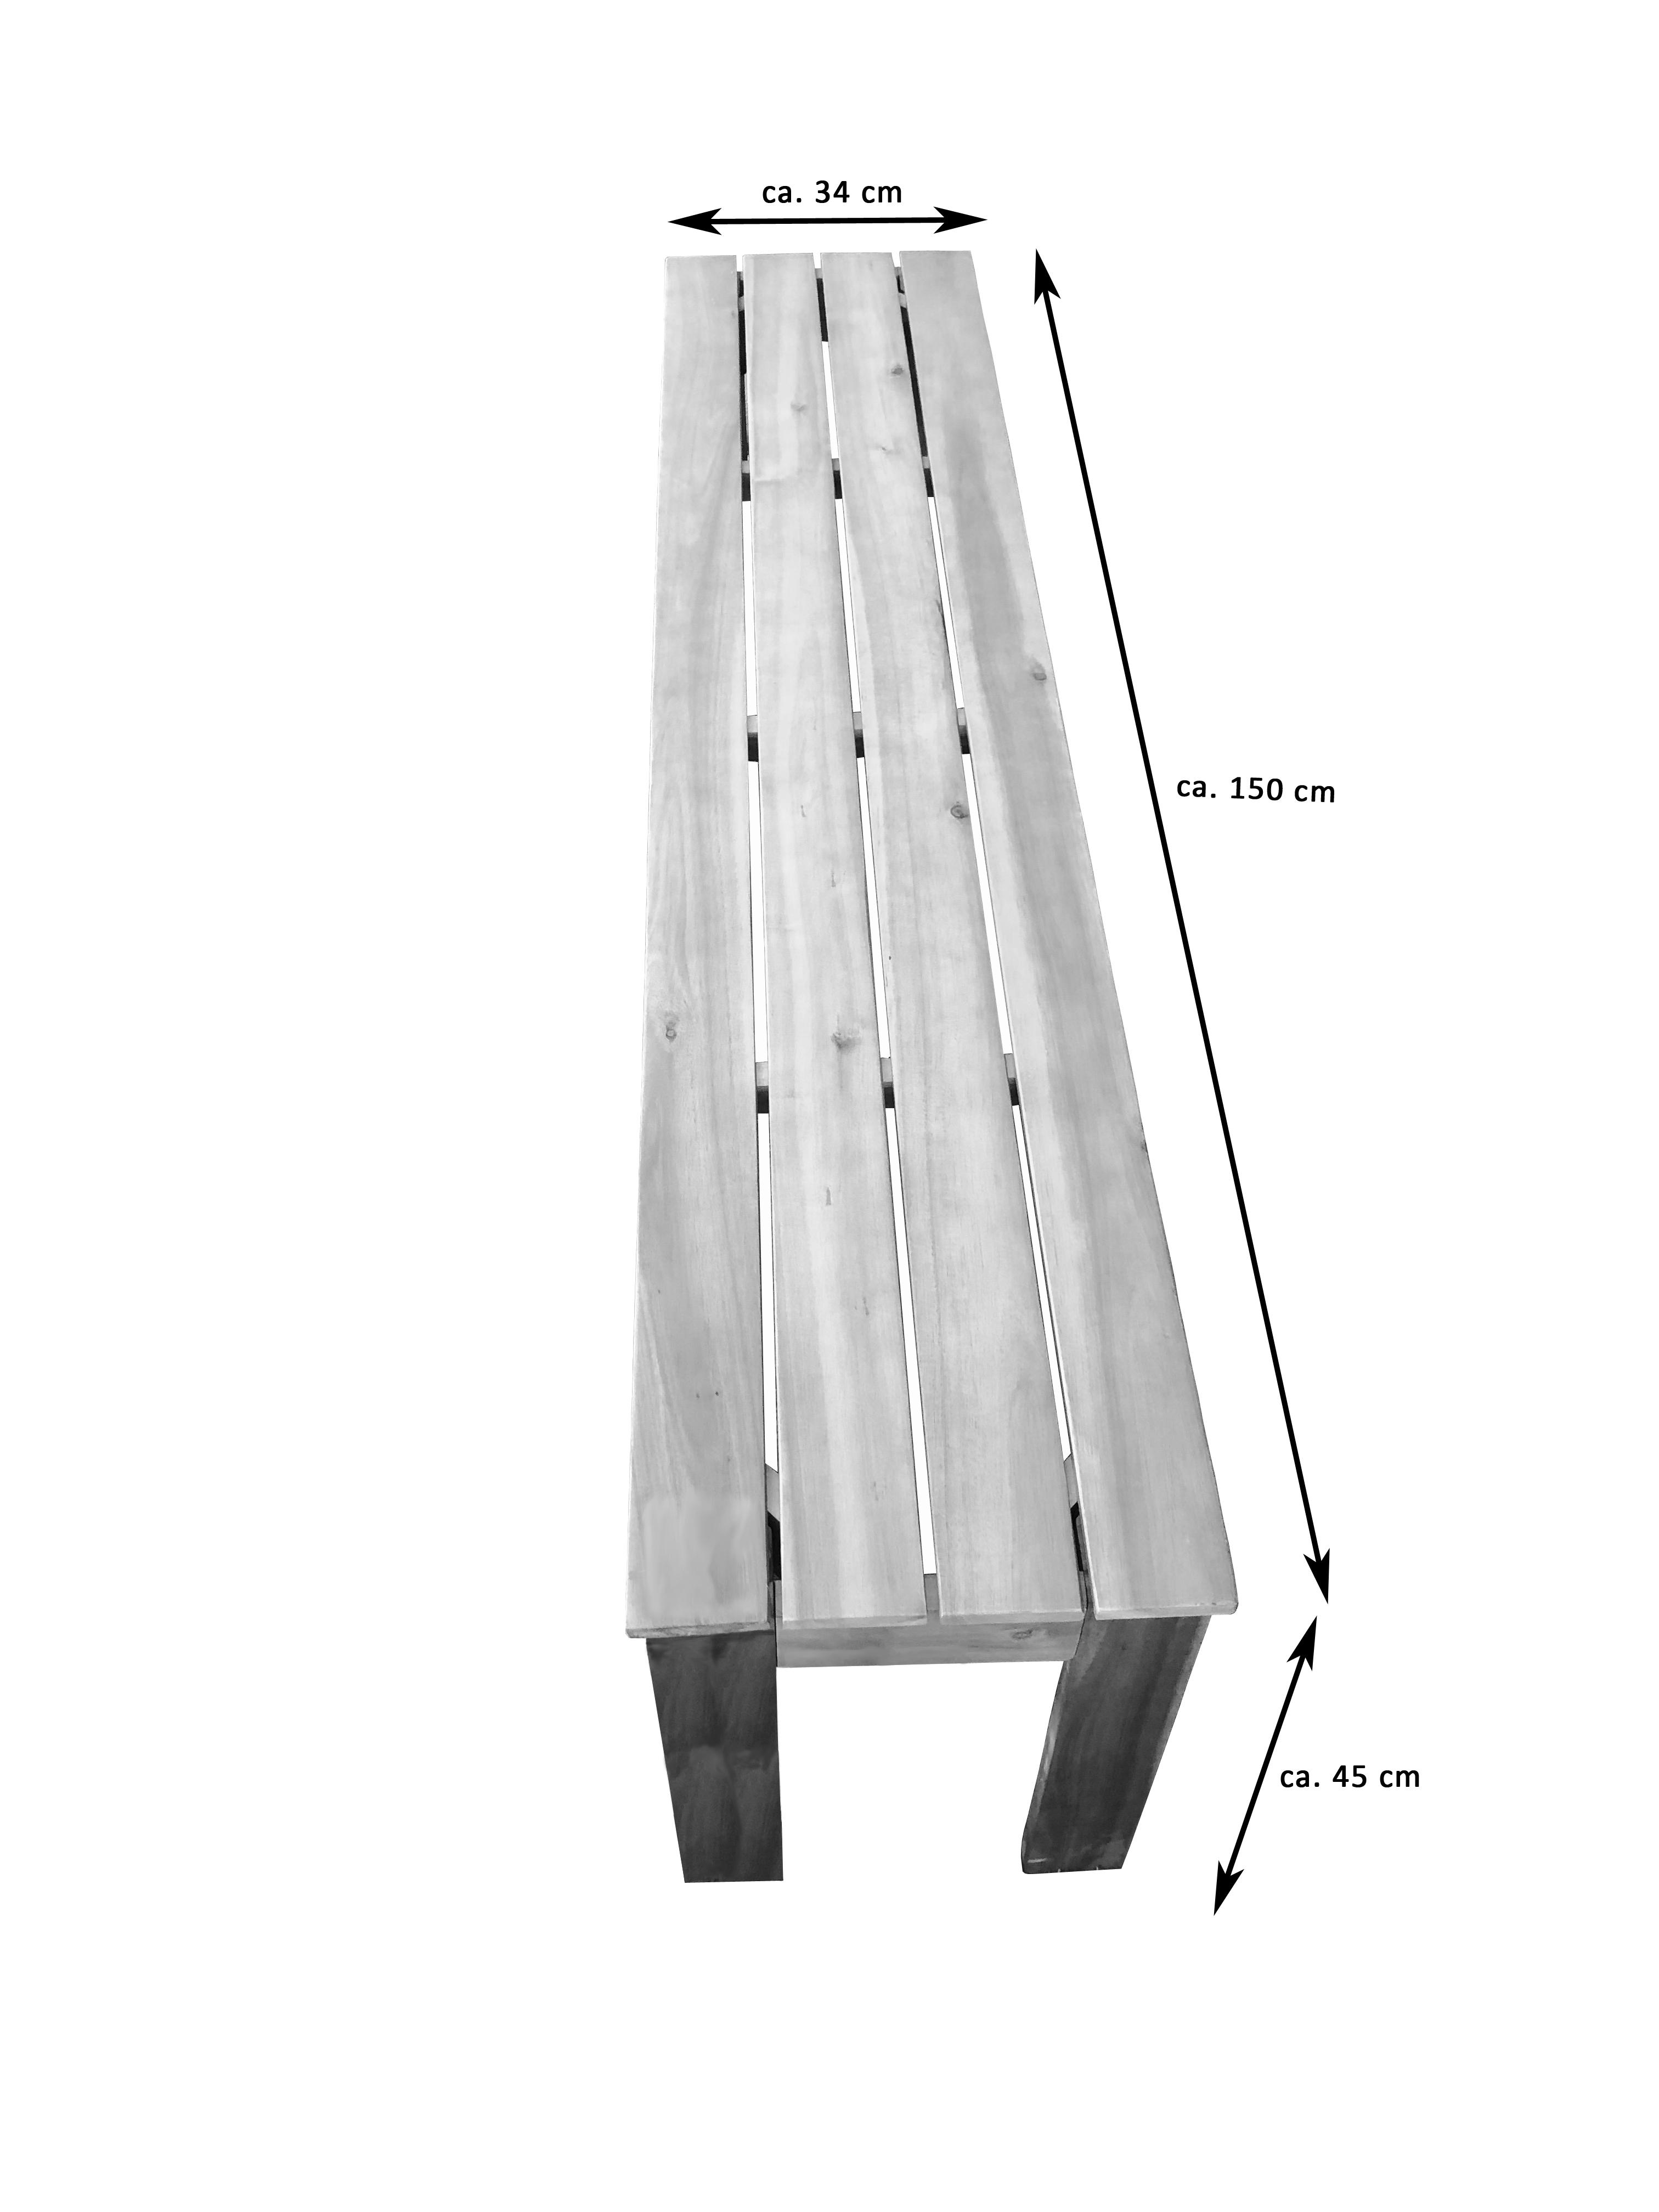 sam gartenbank sitzbank akazie 3 sitzer 150 cm elliott. Black Bedroom Furniture Sets. Home Design Ideas